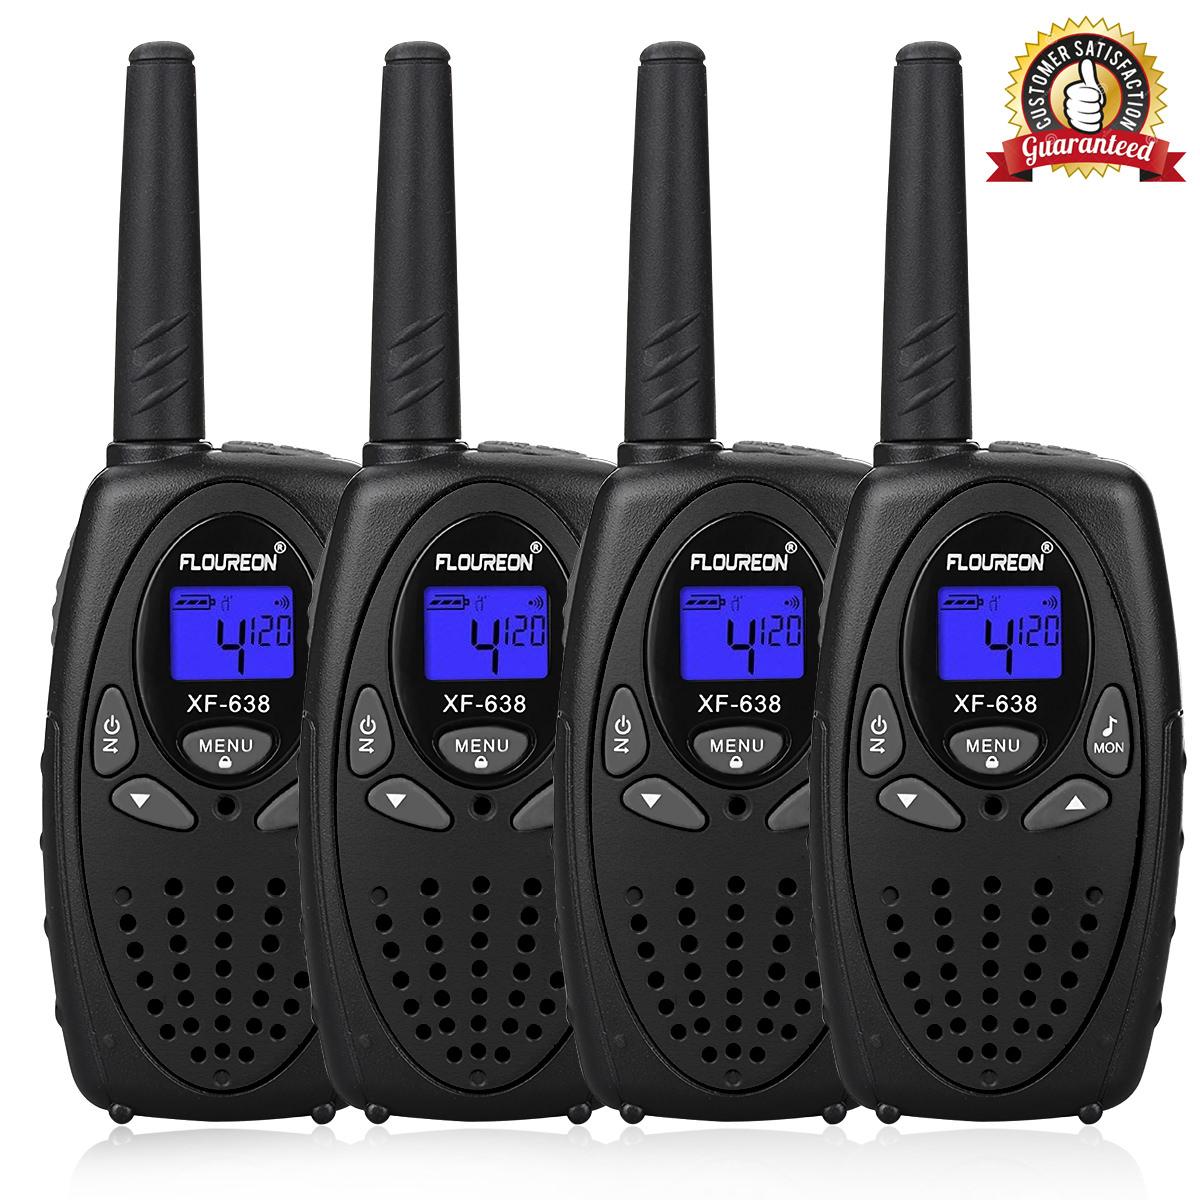 Kids Walkie Talkies, FLOUREON 22 Channel Two-Way Radio Best for Kids Long Range 3000M Handheld Outdoor Interphone/Portable Toy Radio Transceiver(4 Packs)